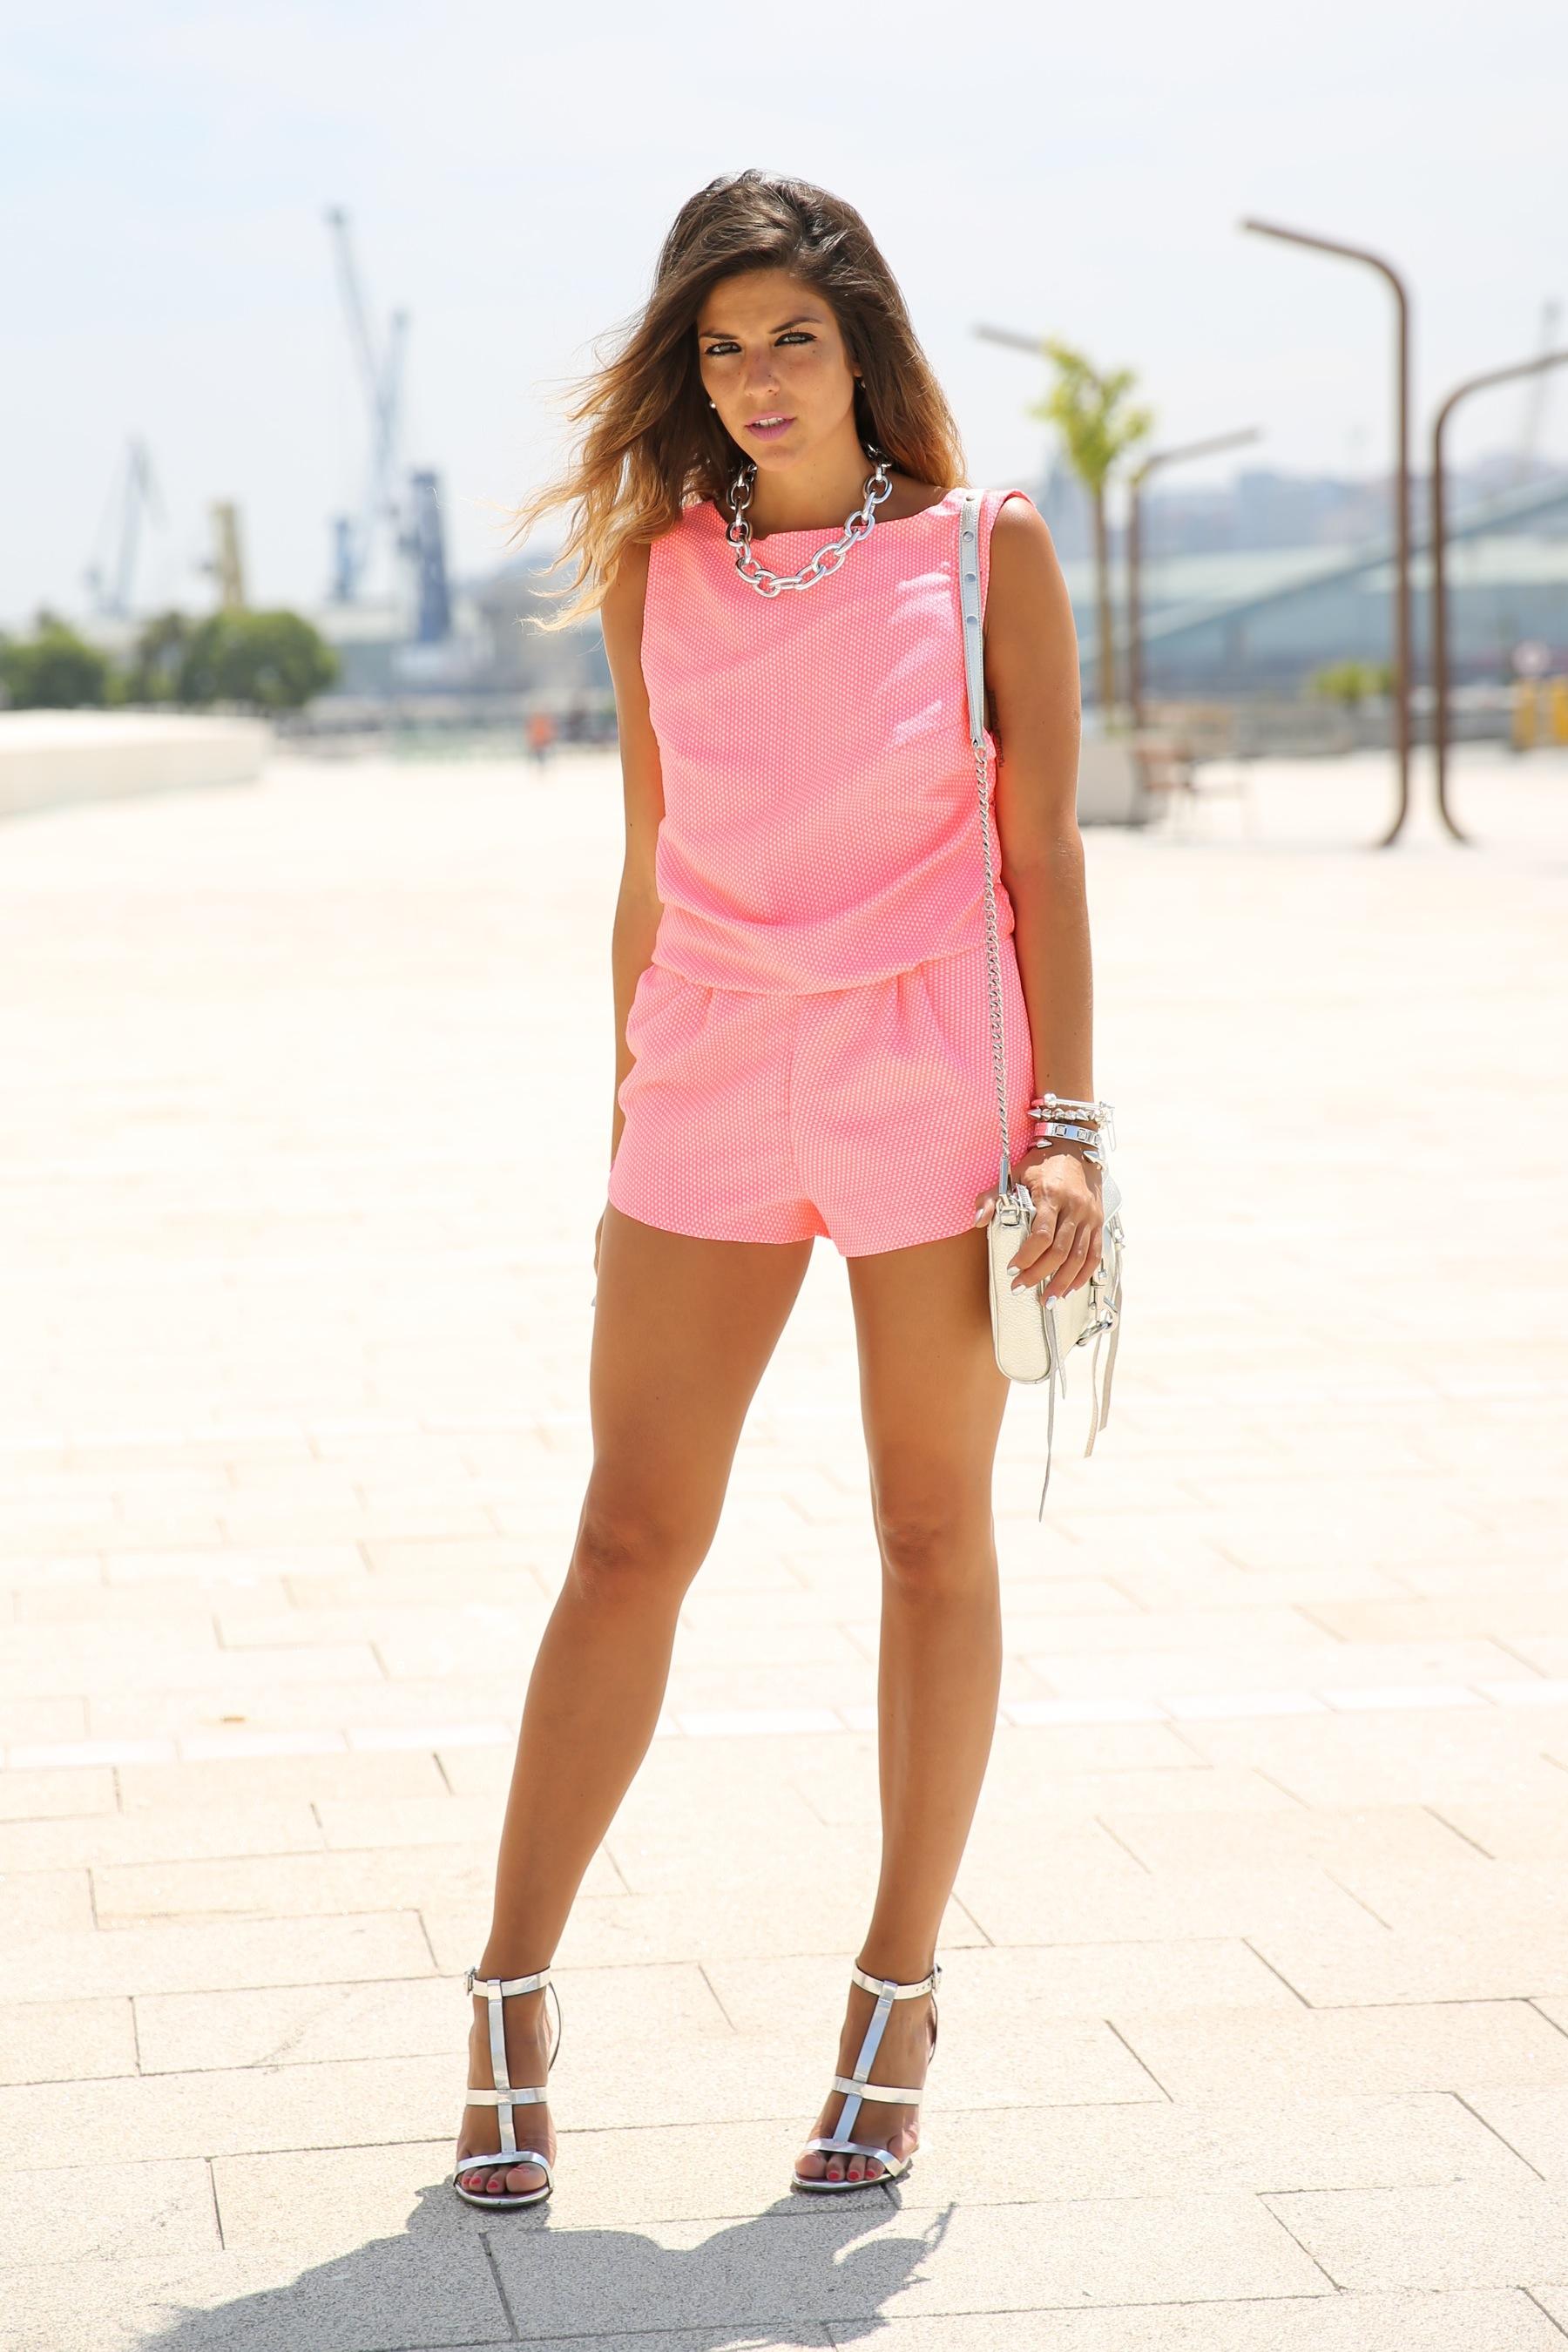 trendy_taste-look-outfit-street_style-ootd-blog-blogger-fashion_spain-moda_españa-silver_bag-bolso_plata-mono_rosa-mekdes-coruña-marina-12